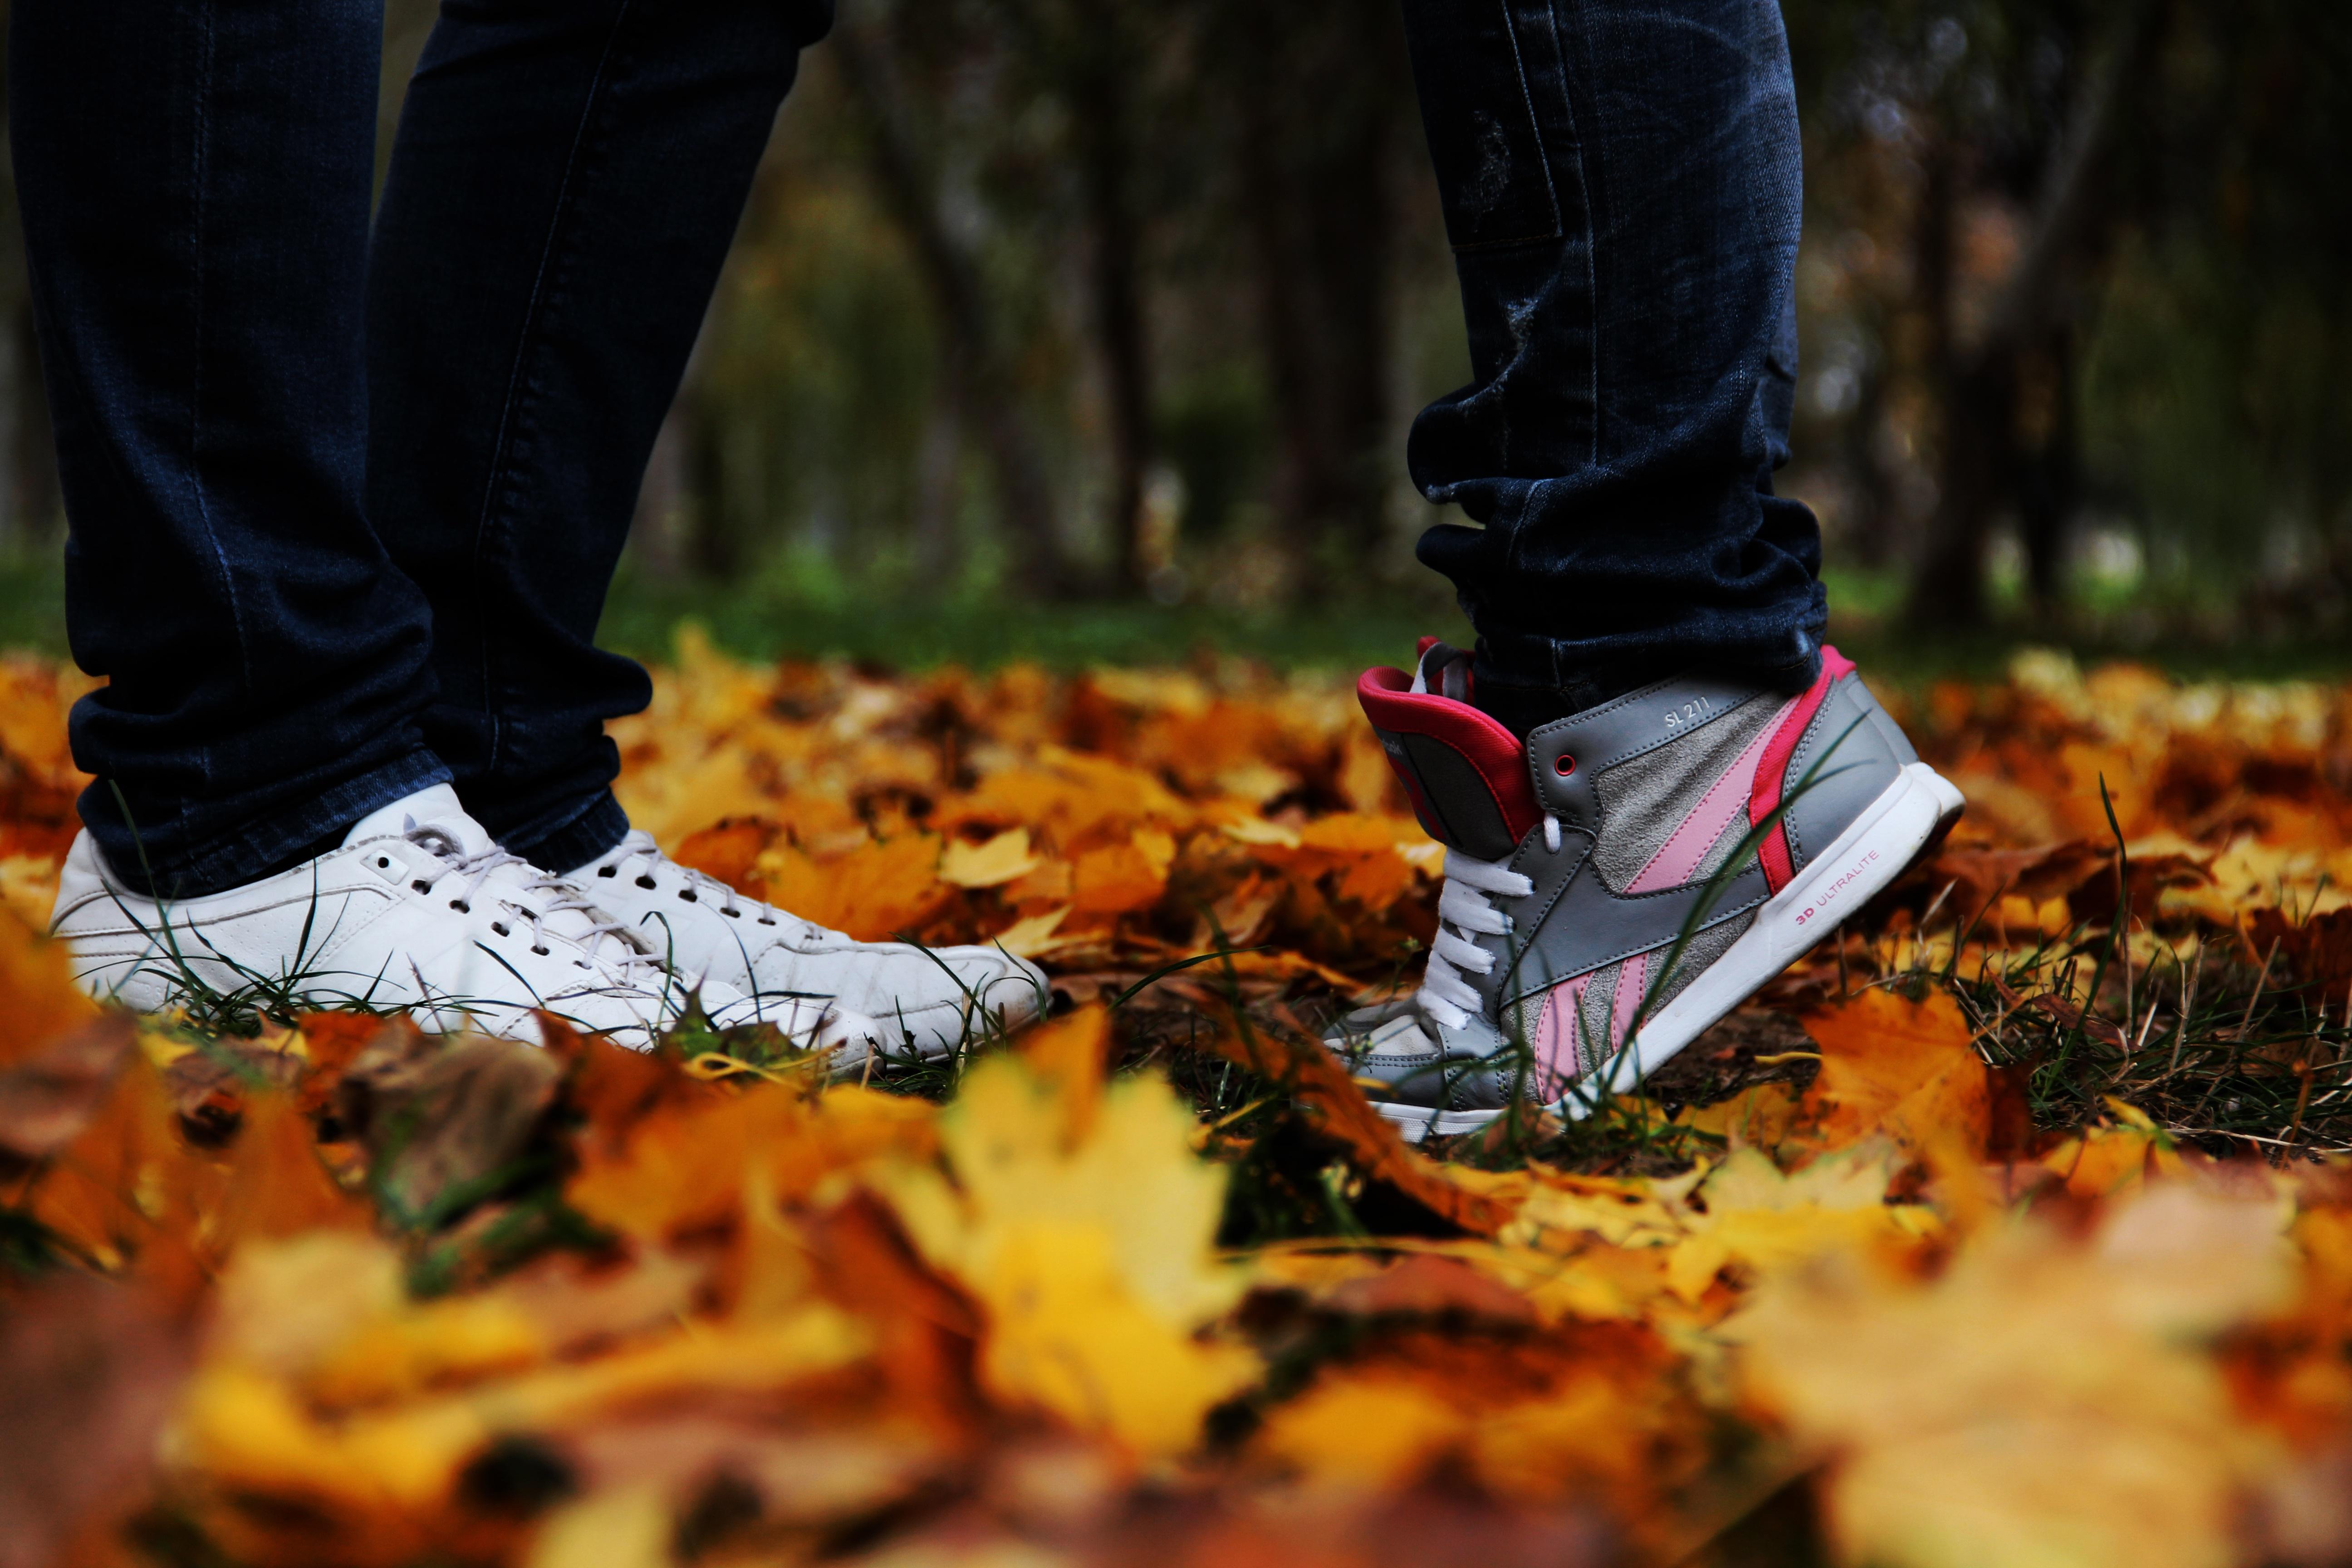 Fotos gratis : árbol, hoja, amor, primavera, color, otoño, Pareja ...